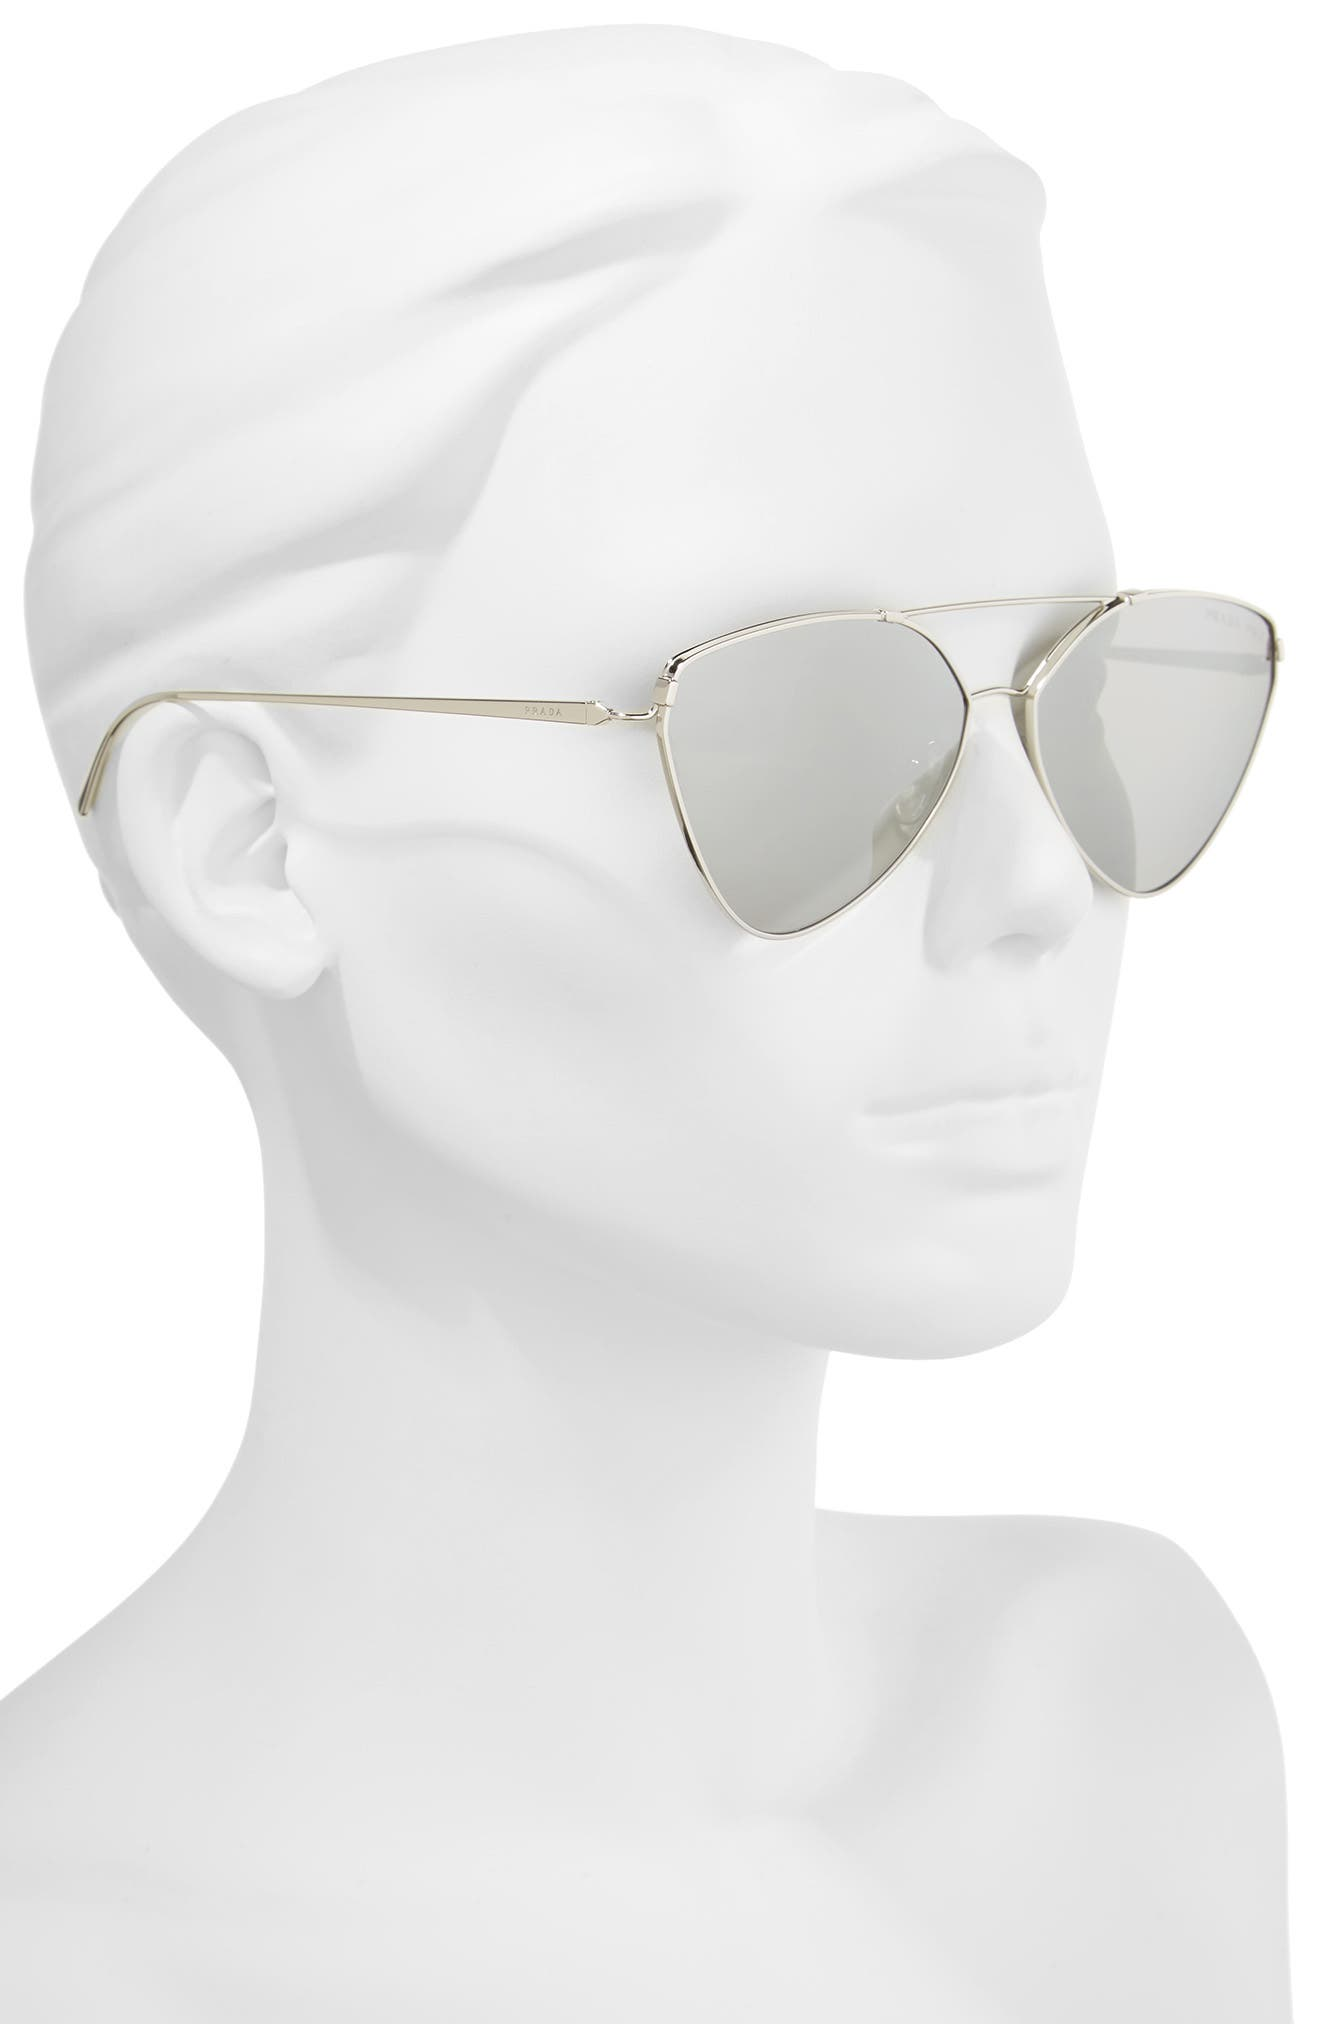 62mm Polarized Oversize Aviator Sunglasses,                             Alternate thumbnail 3, color,                             042